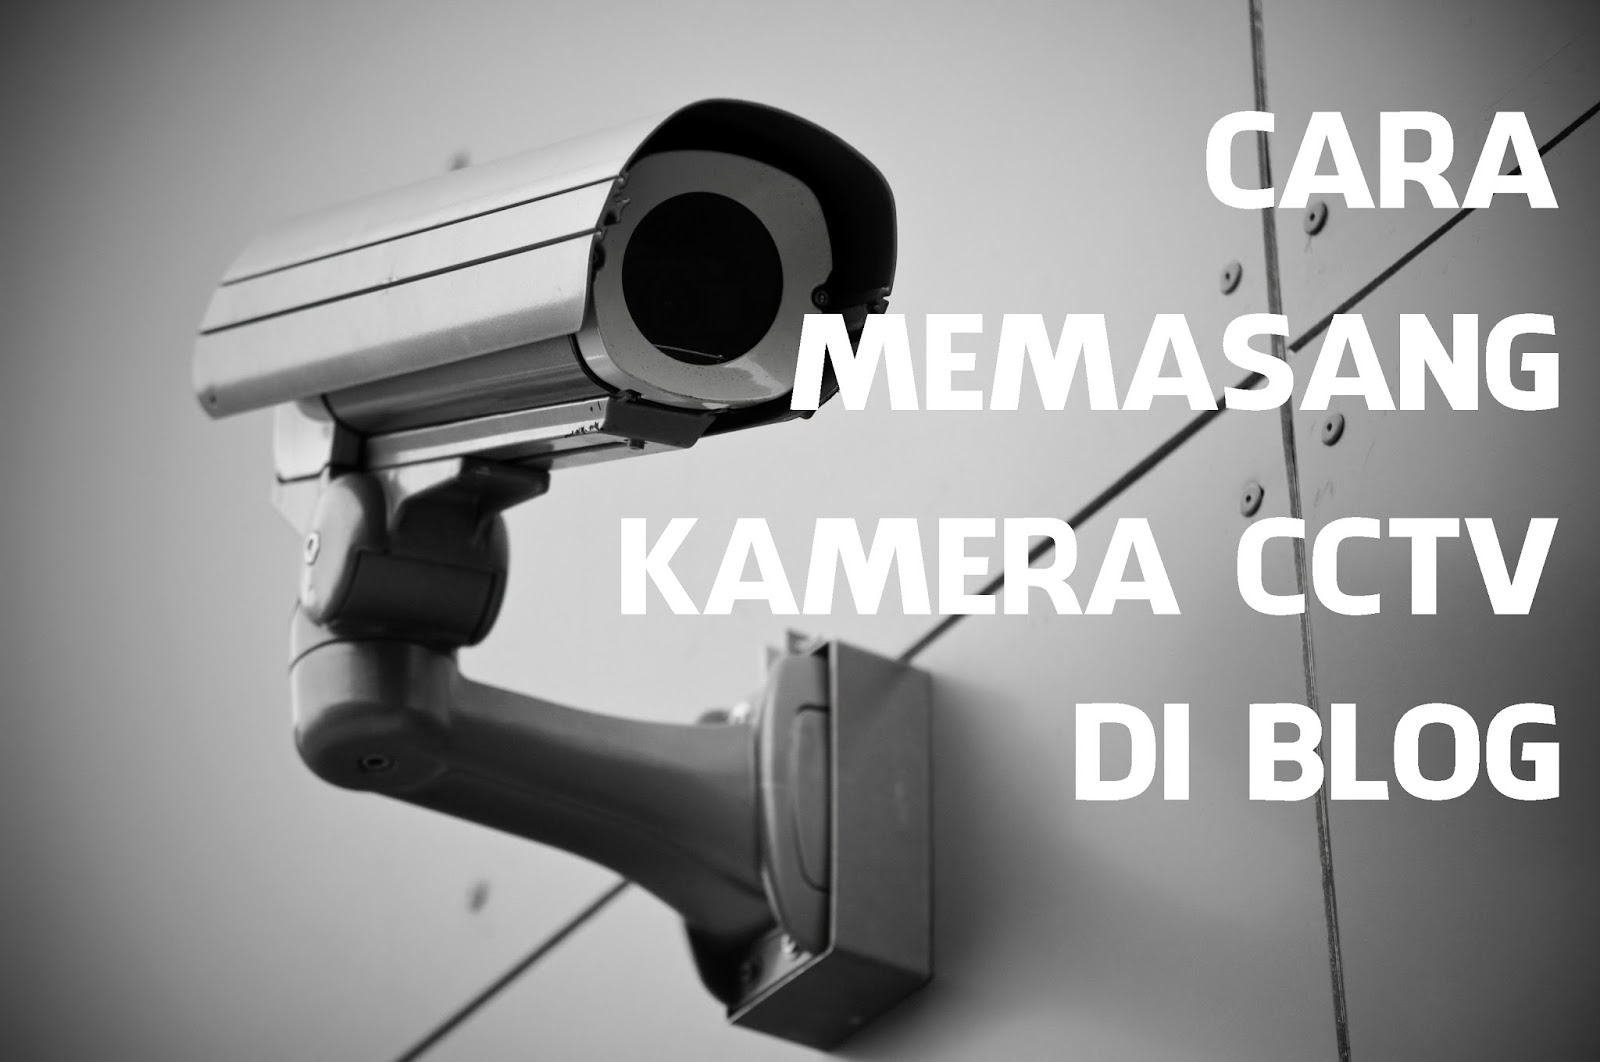 Cara Memasang Widget Kamera CCTV di Blog